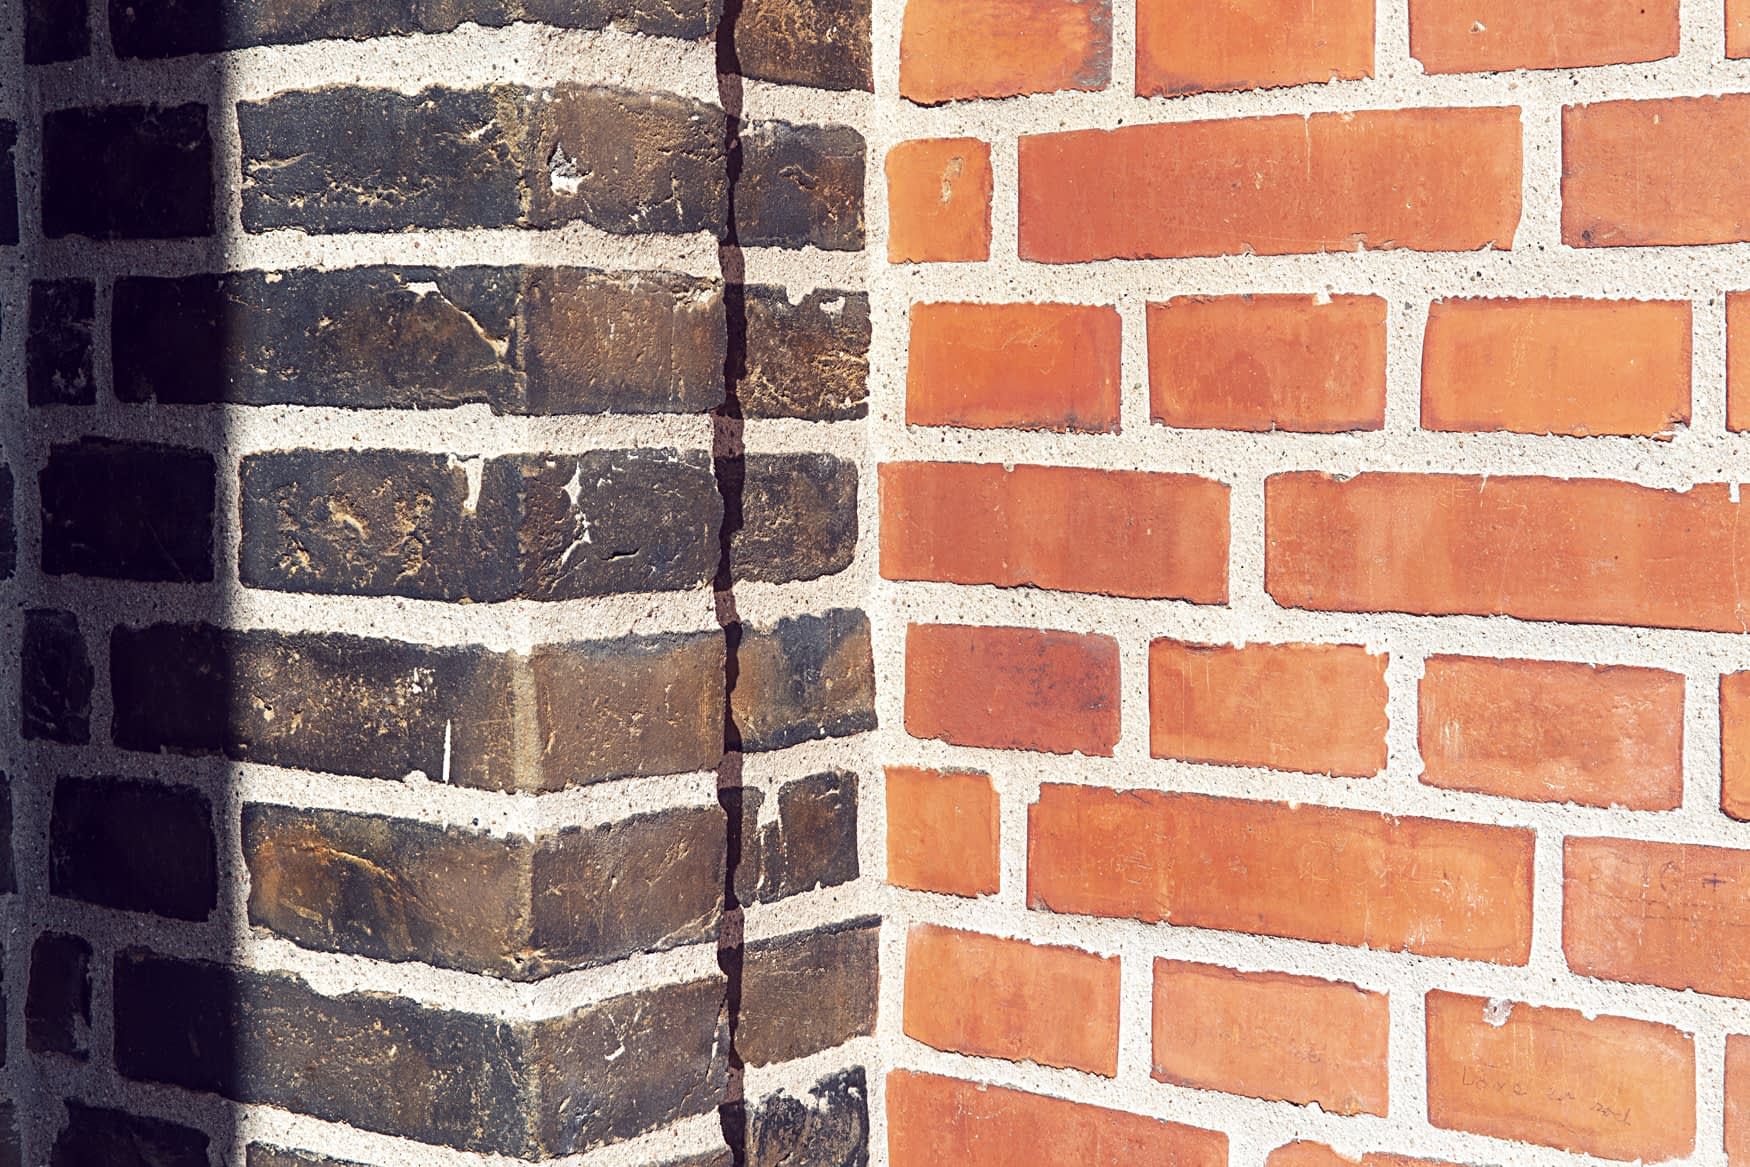 Detalje fra facaderenovering i Brønshøj